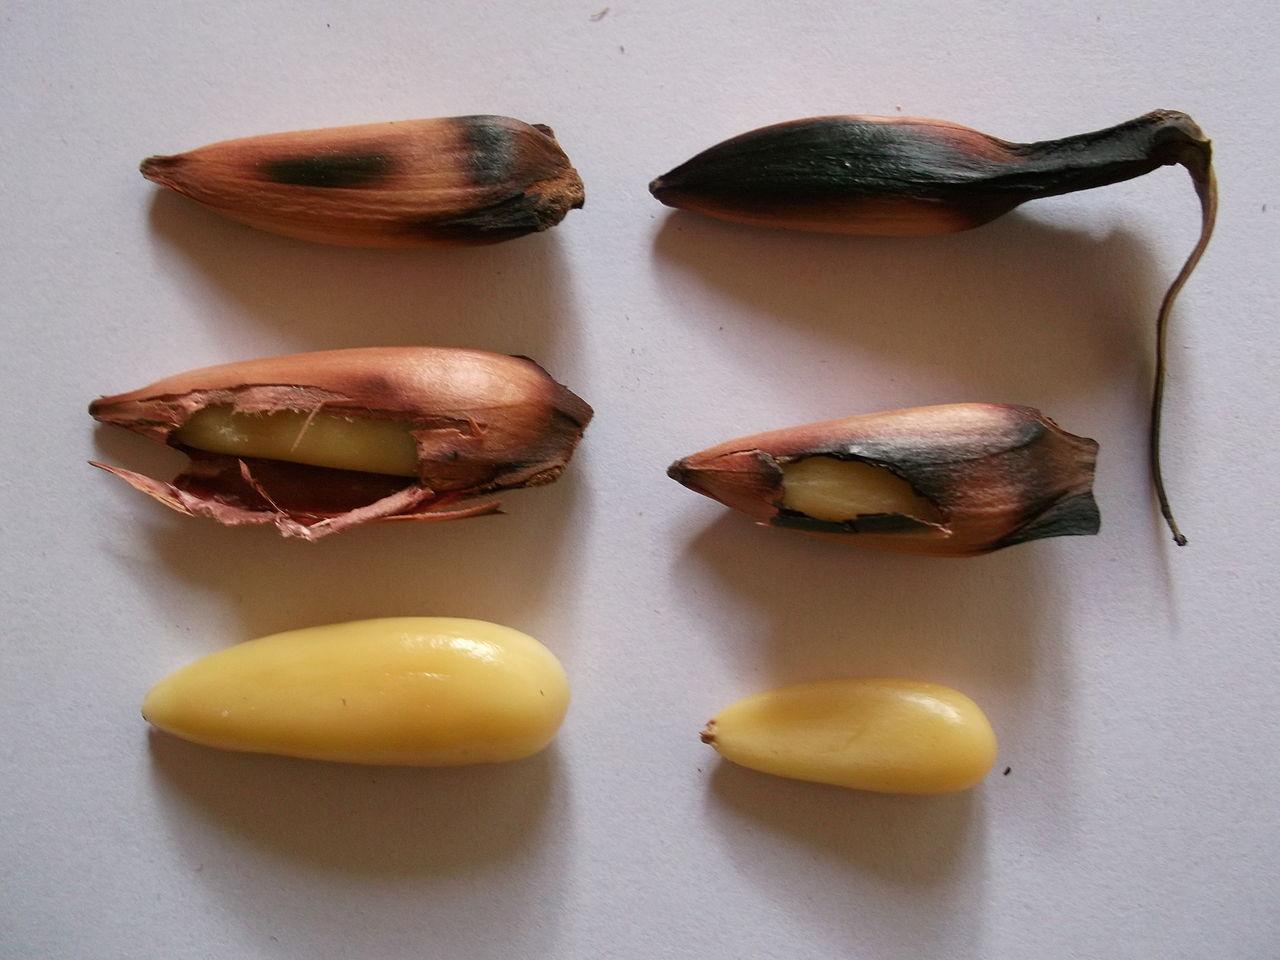 Dateipiñones De Araucaria Cocinadosjpg Wikipedia